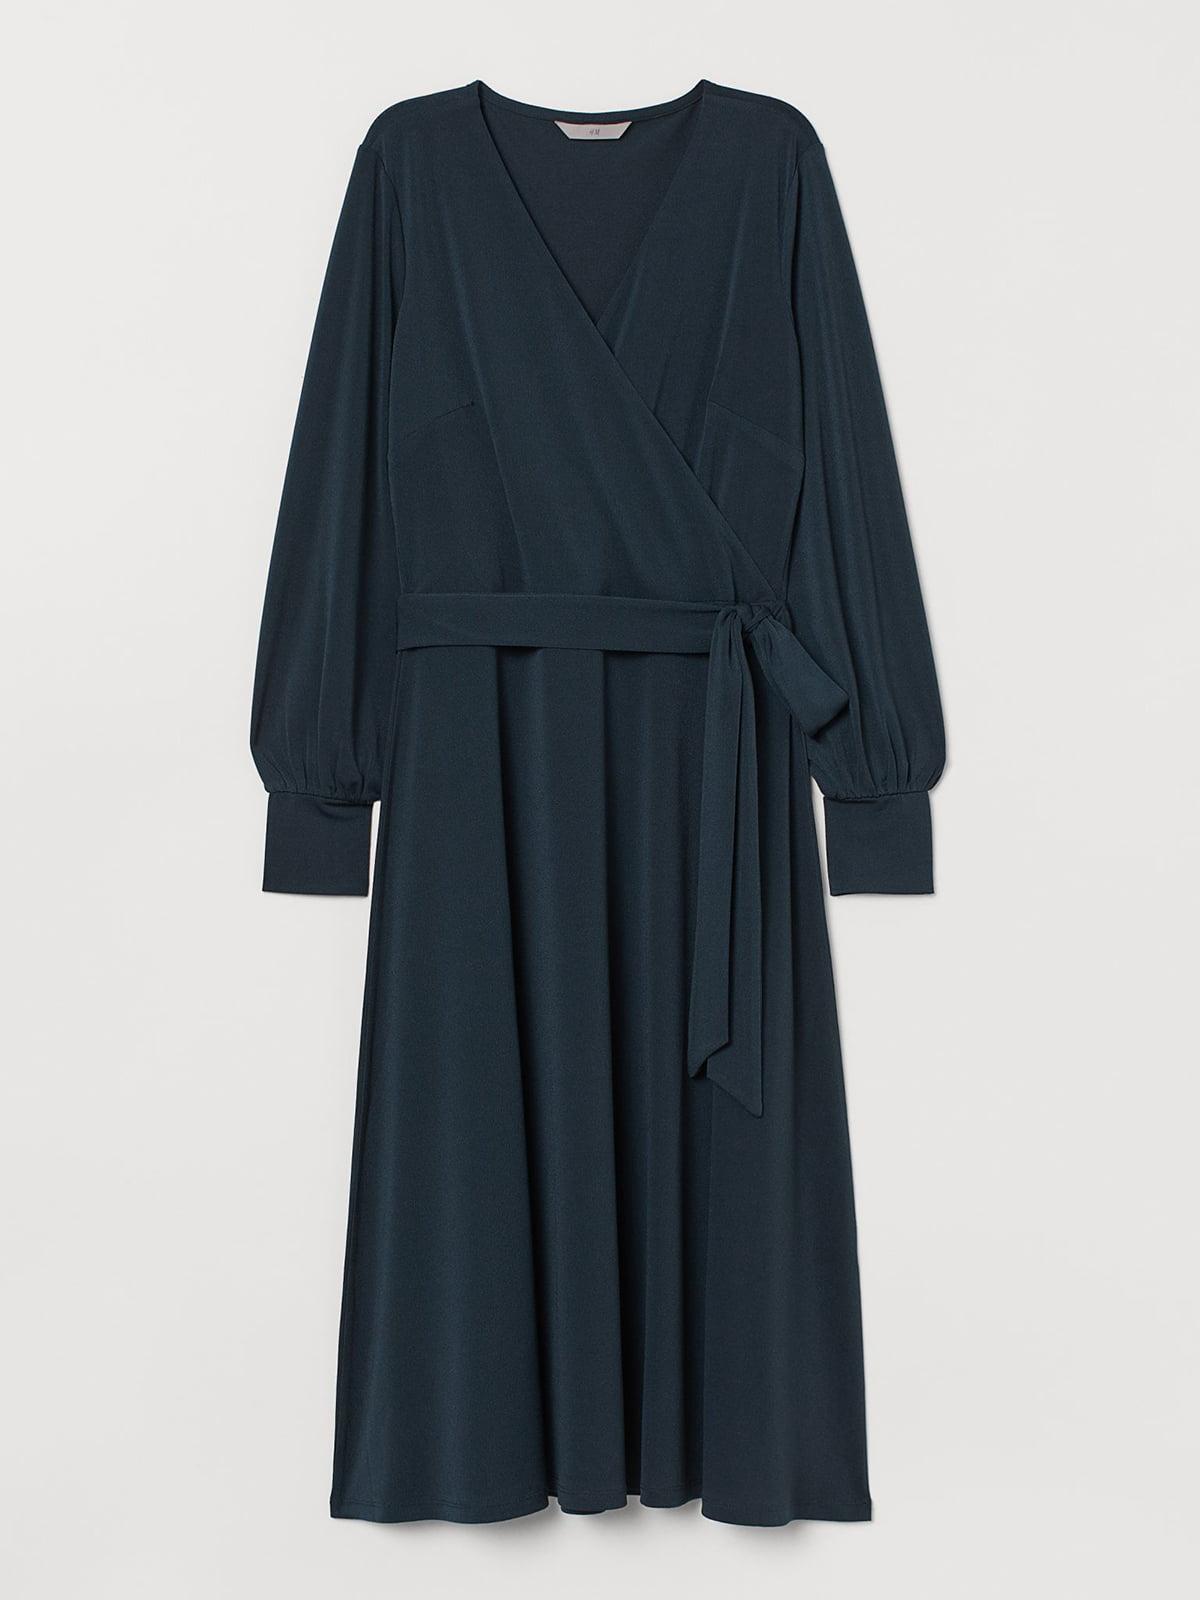 Платье темно-бирюзовое | 5680210